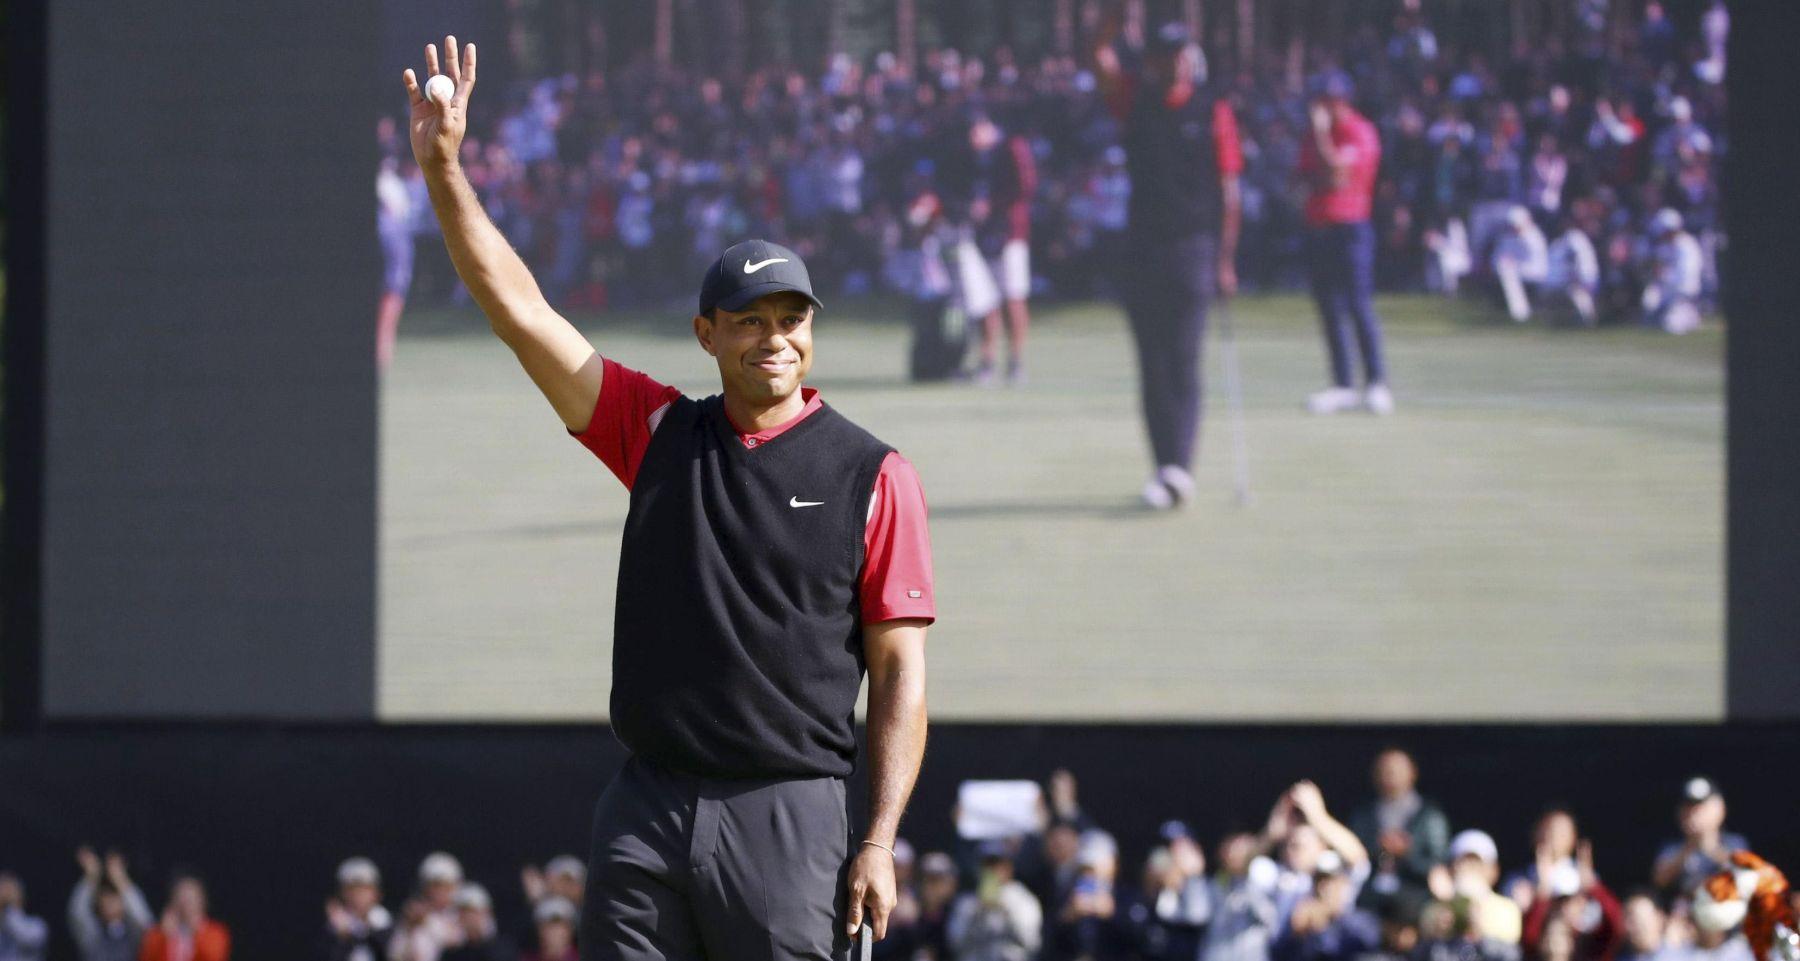 Tiger Woods 82 PGA Tour Win in Japan 001